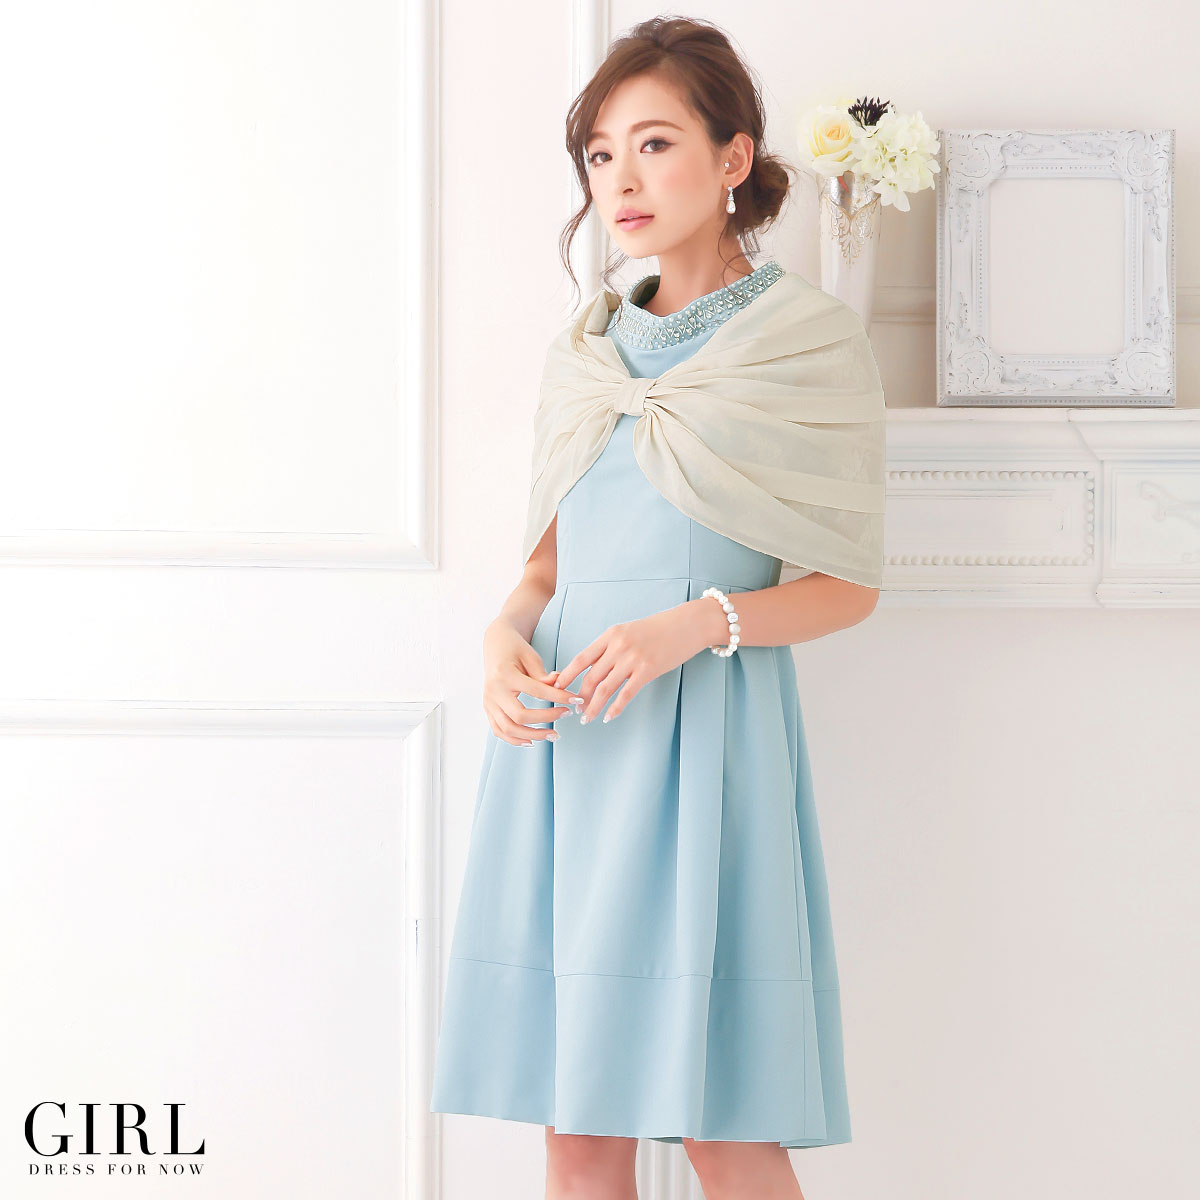 Dress shop GIRL   Rakuten Global Market: Cape scarf wrap reversible ...